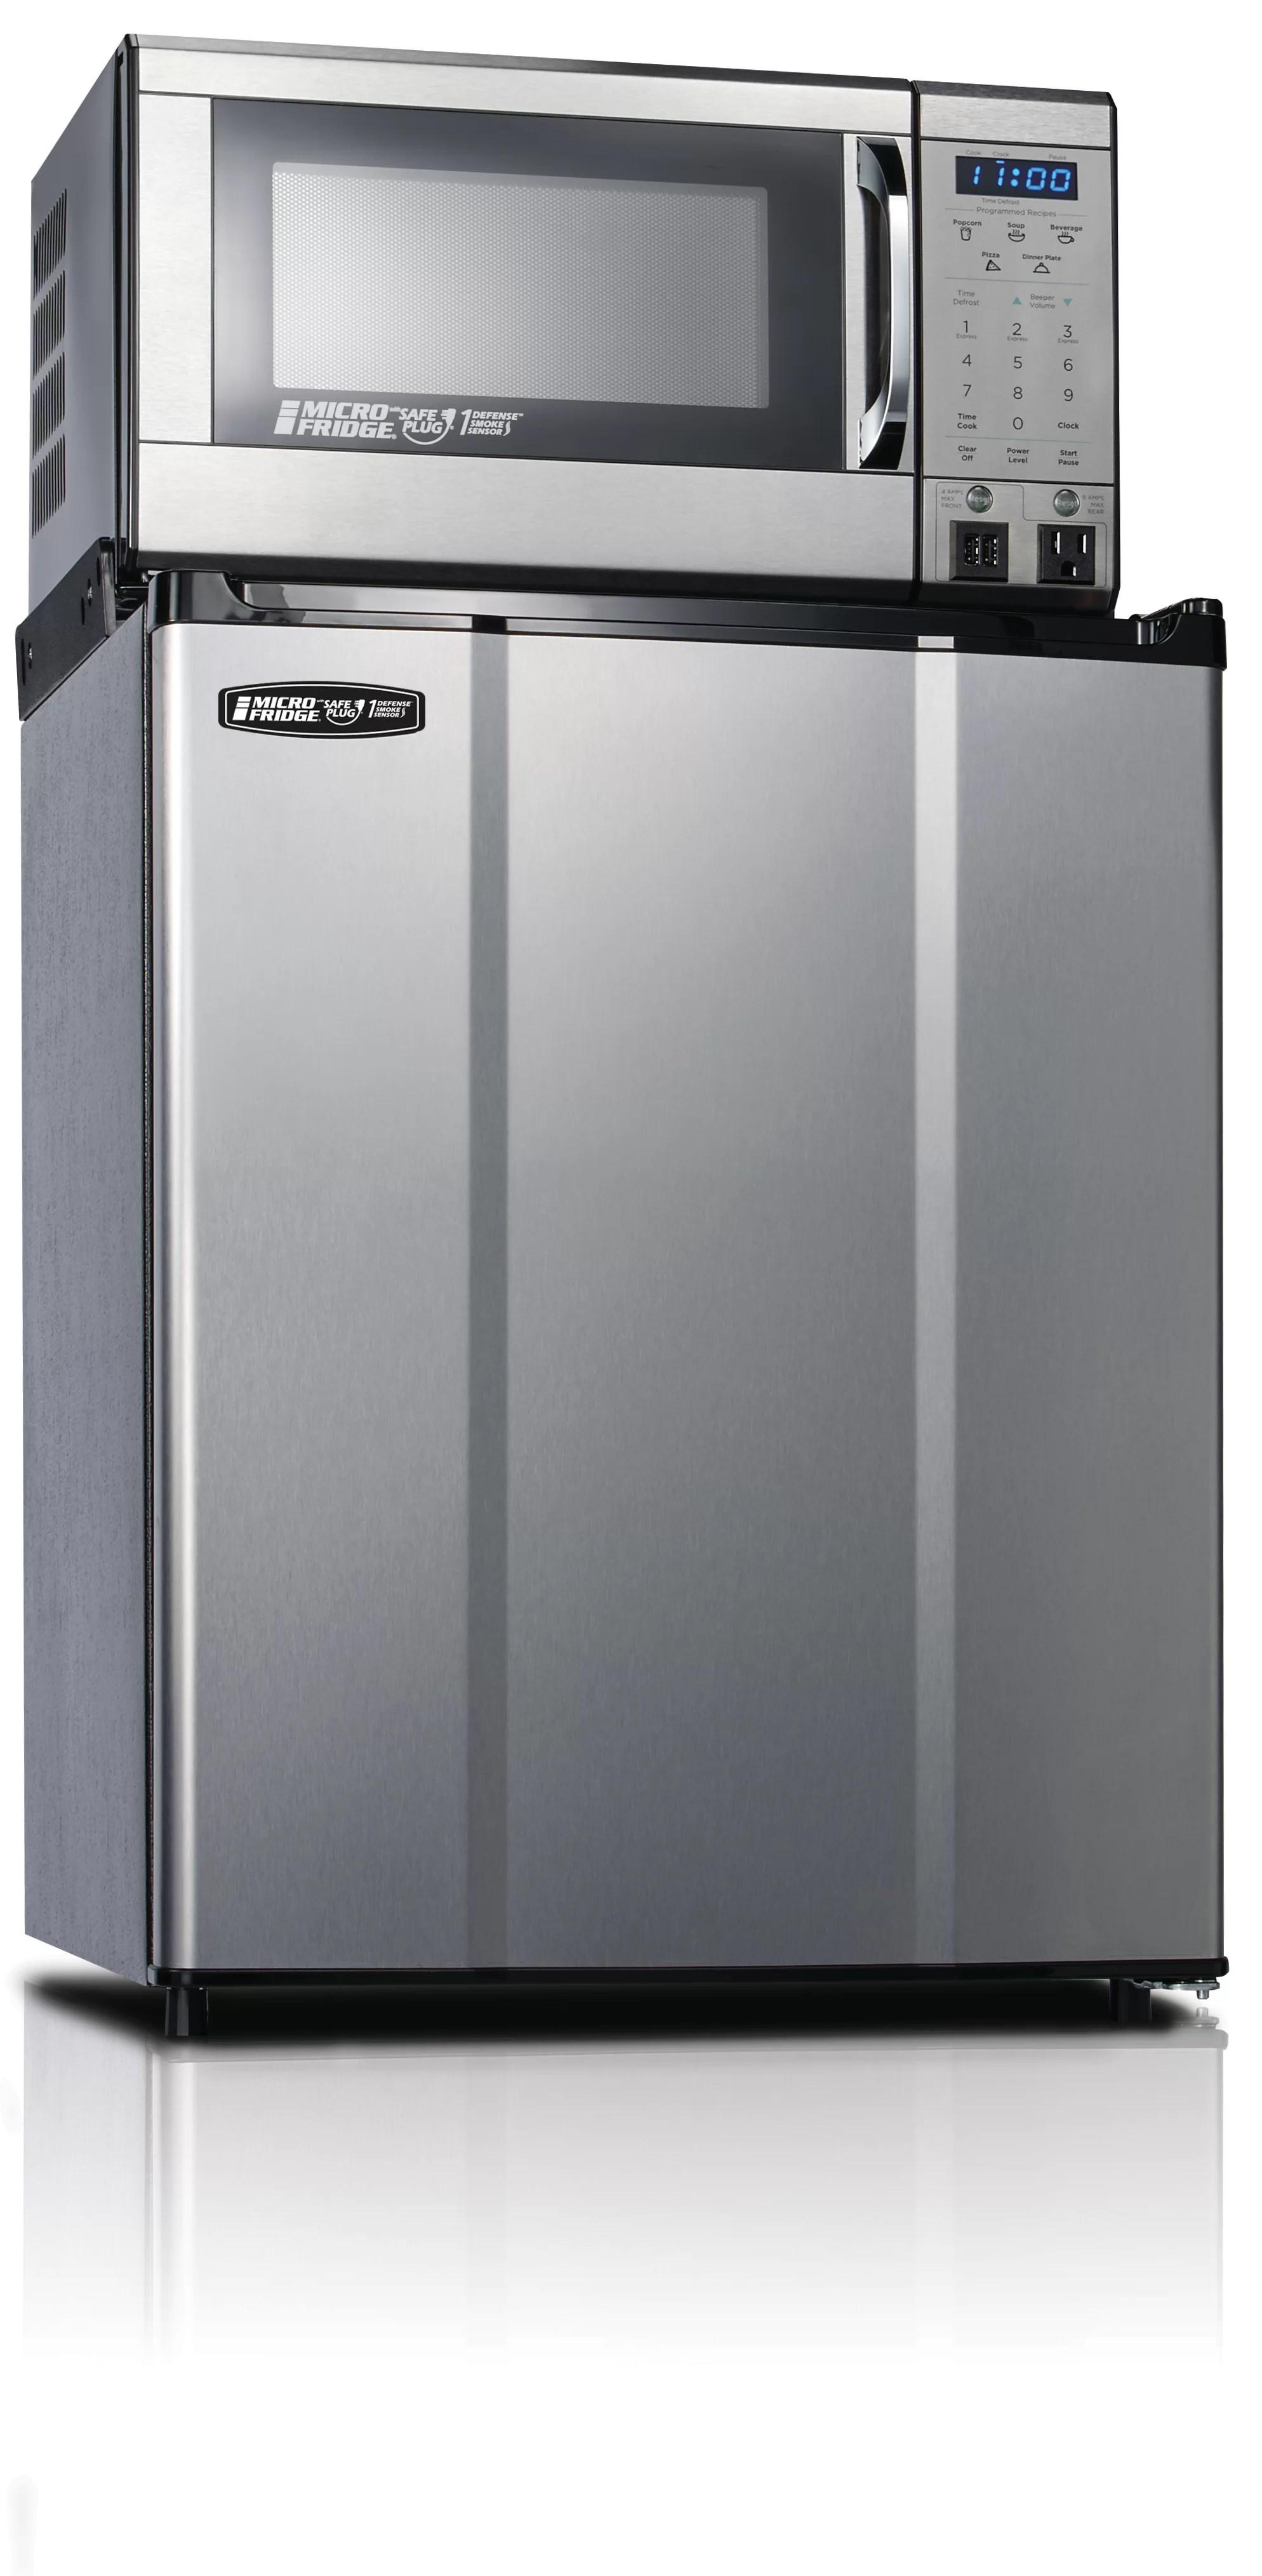 microfridge safe plug 2 3 cubic feet cu ft freestanding mini fridge with microwave